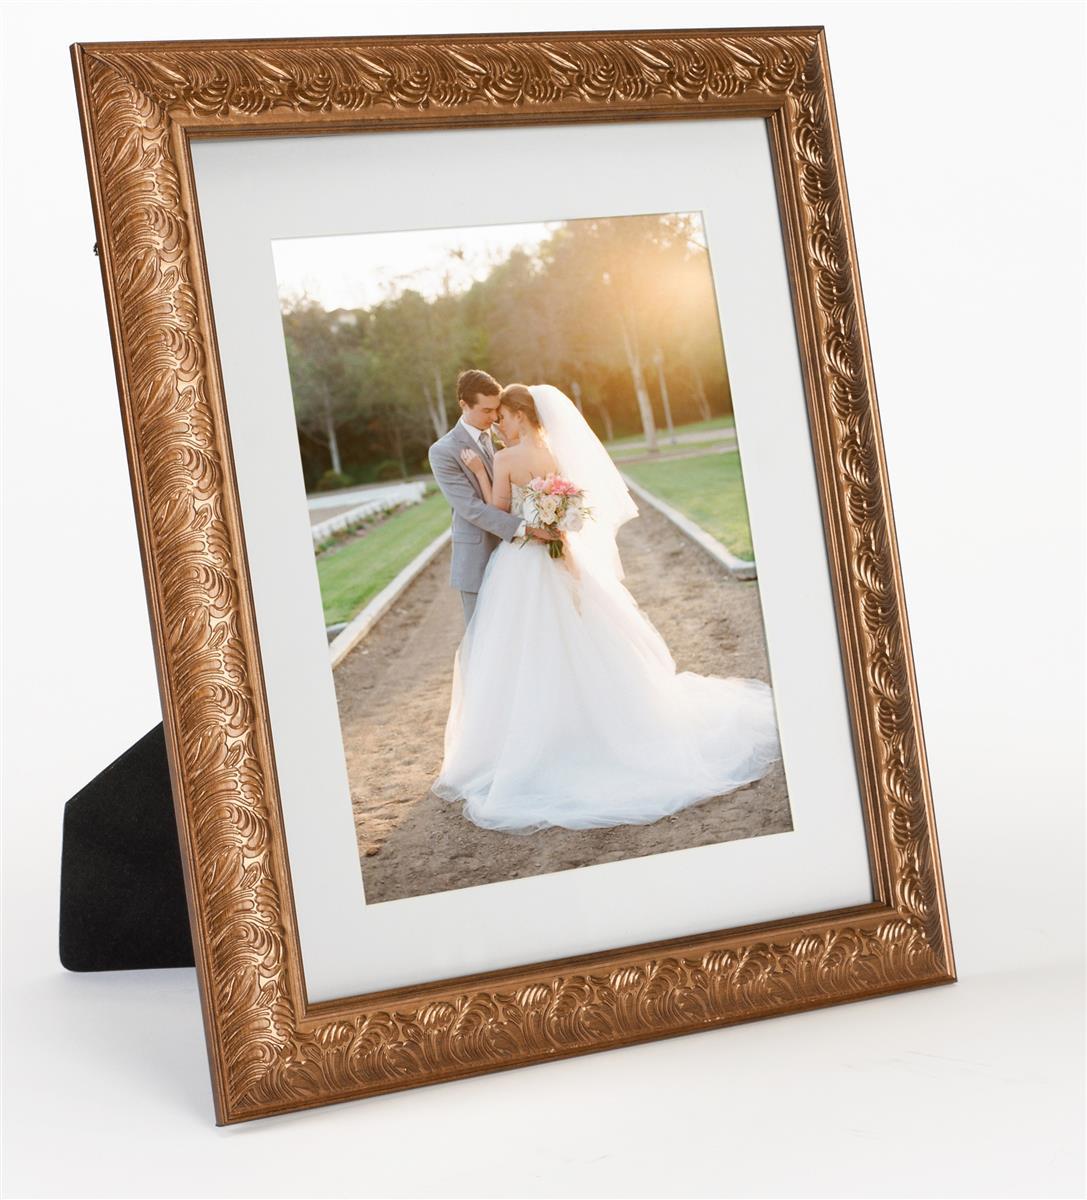 Ornate Picture Frame Bronze Decorative Trim